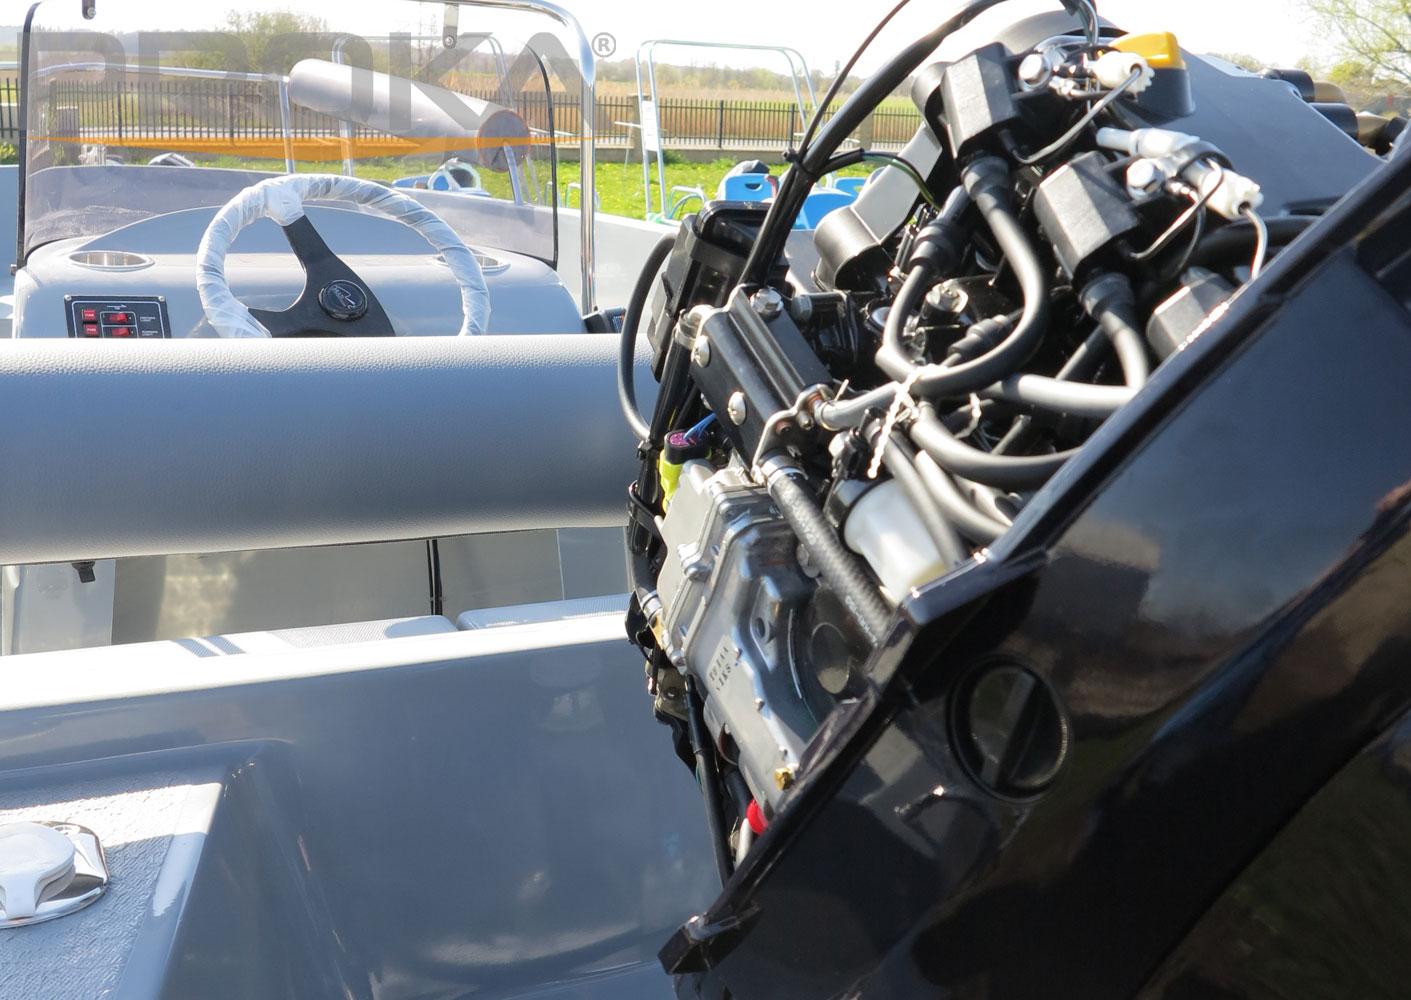 serwis motorówek